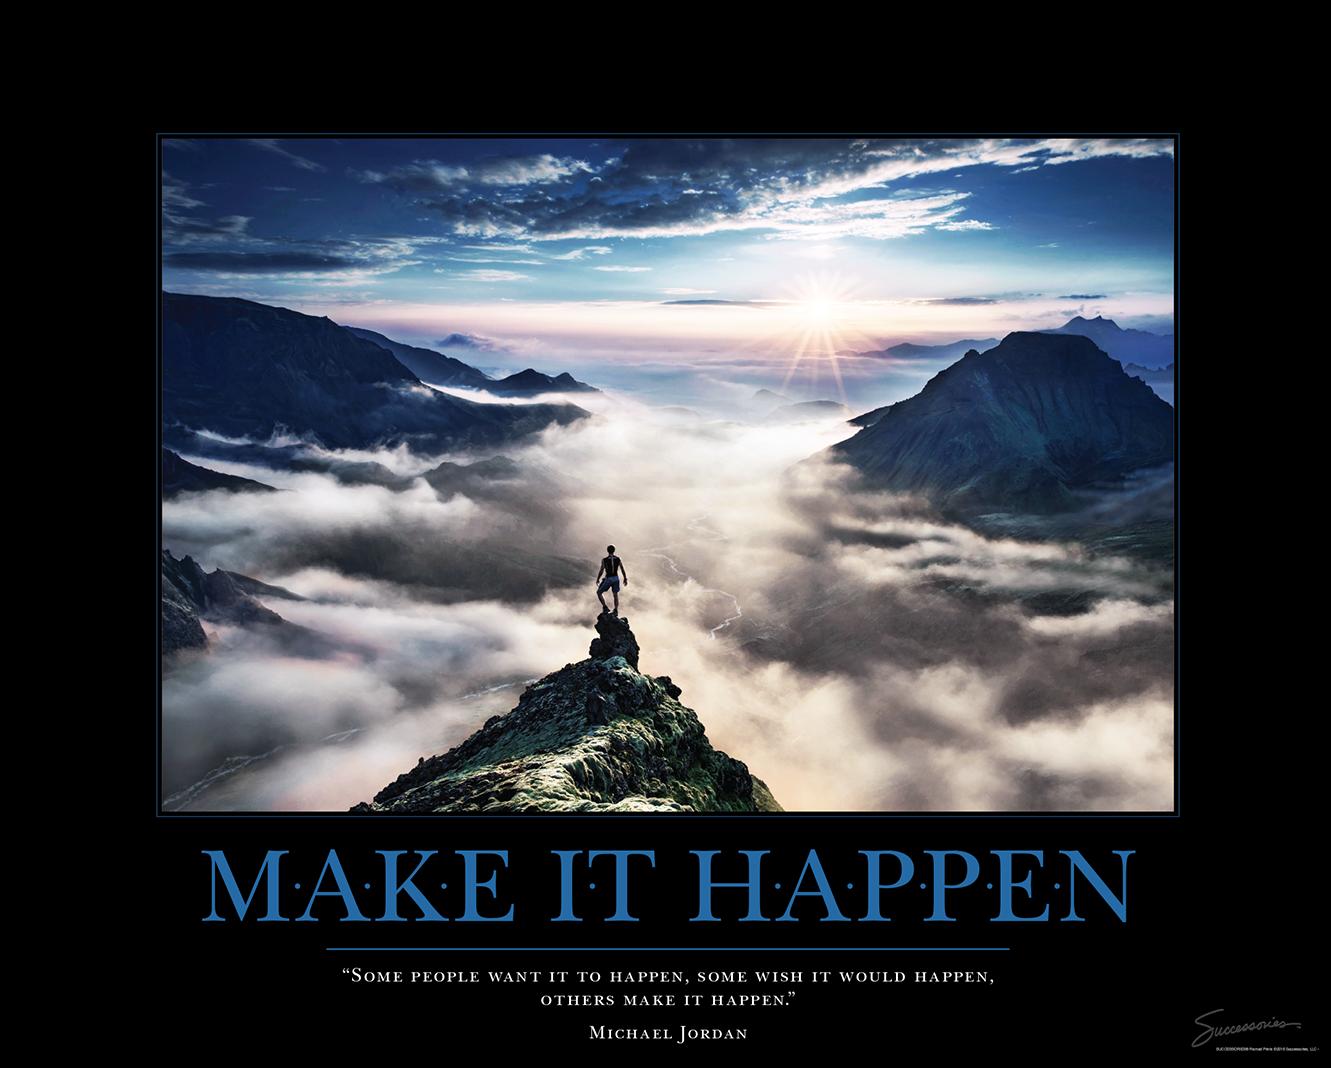 Al Franken Memes >> Motivational posters for office: How they became so popular — Quartz at Work